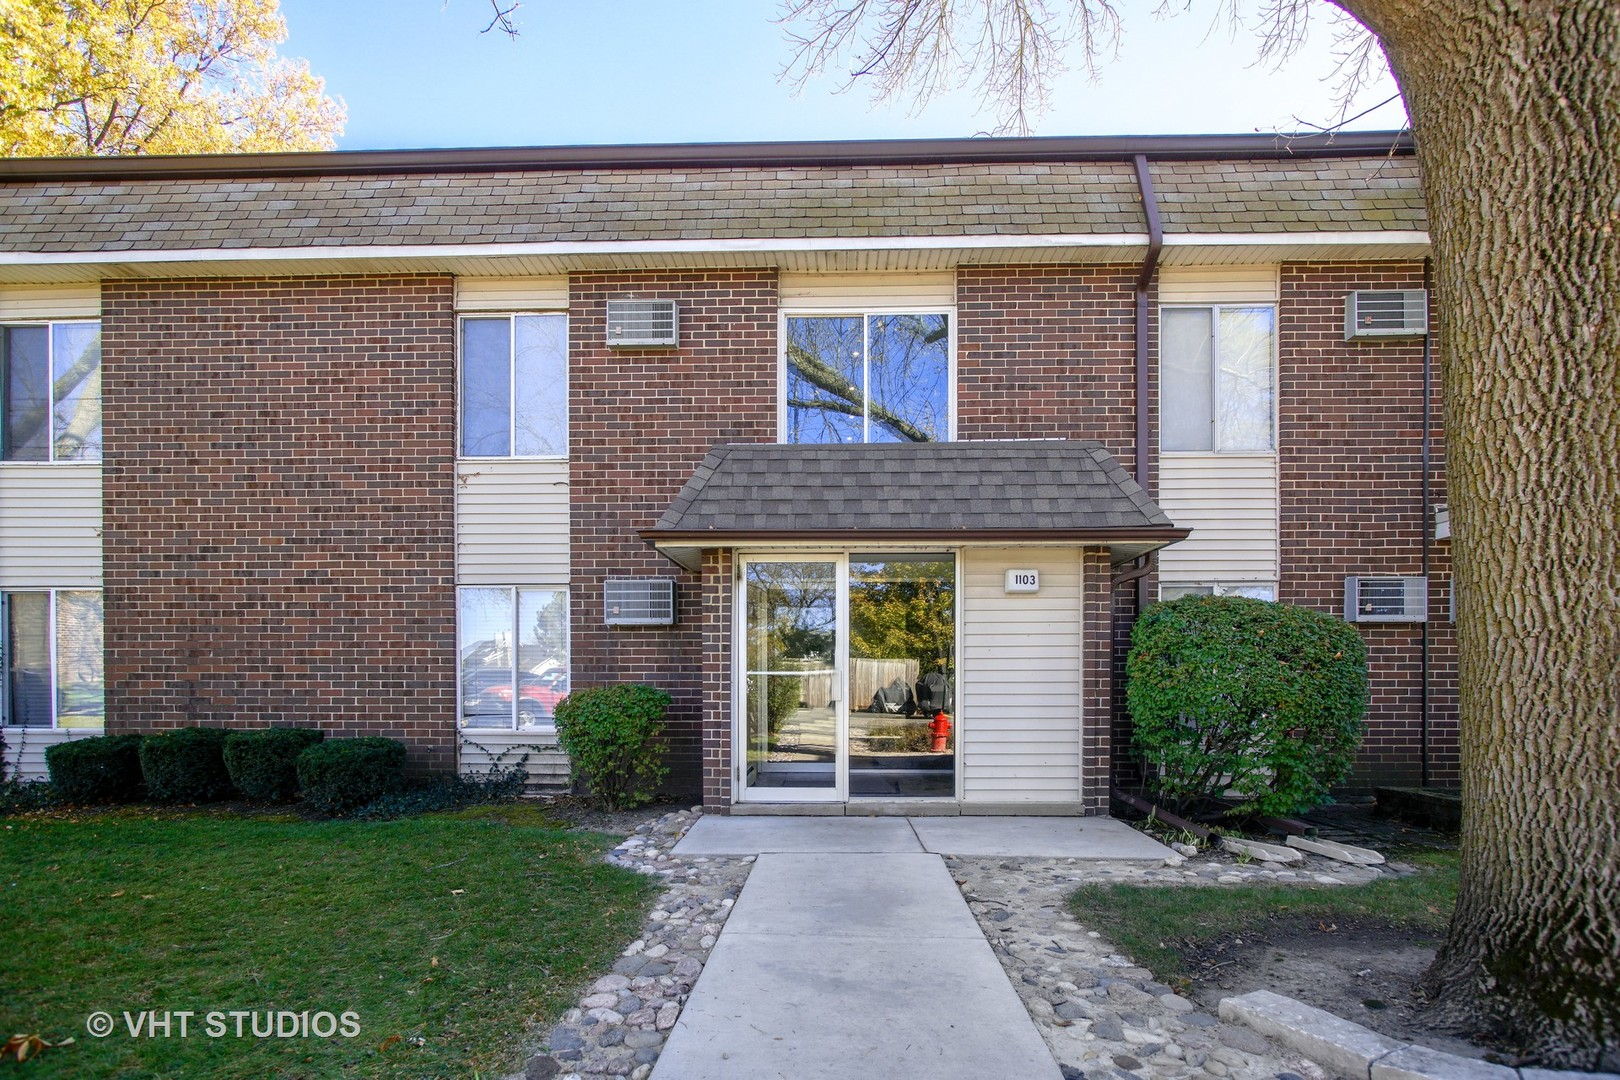 1103 Miller Lane, Unit 105, Buffalo Grove, Illinois 60089